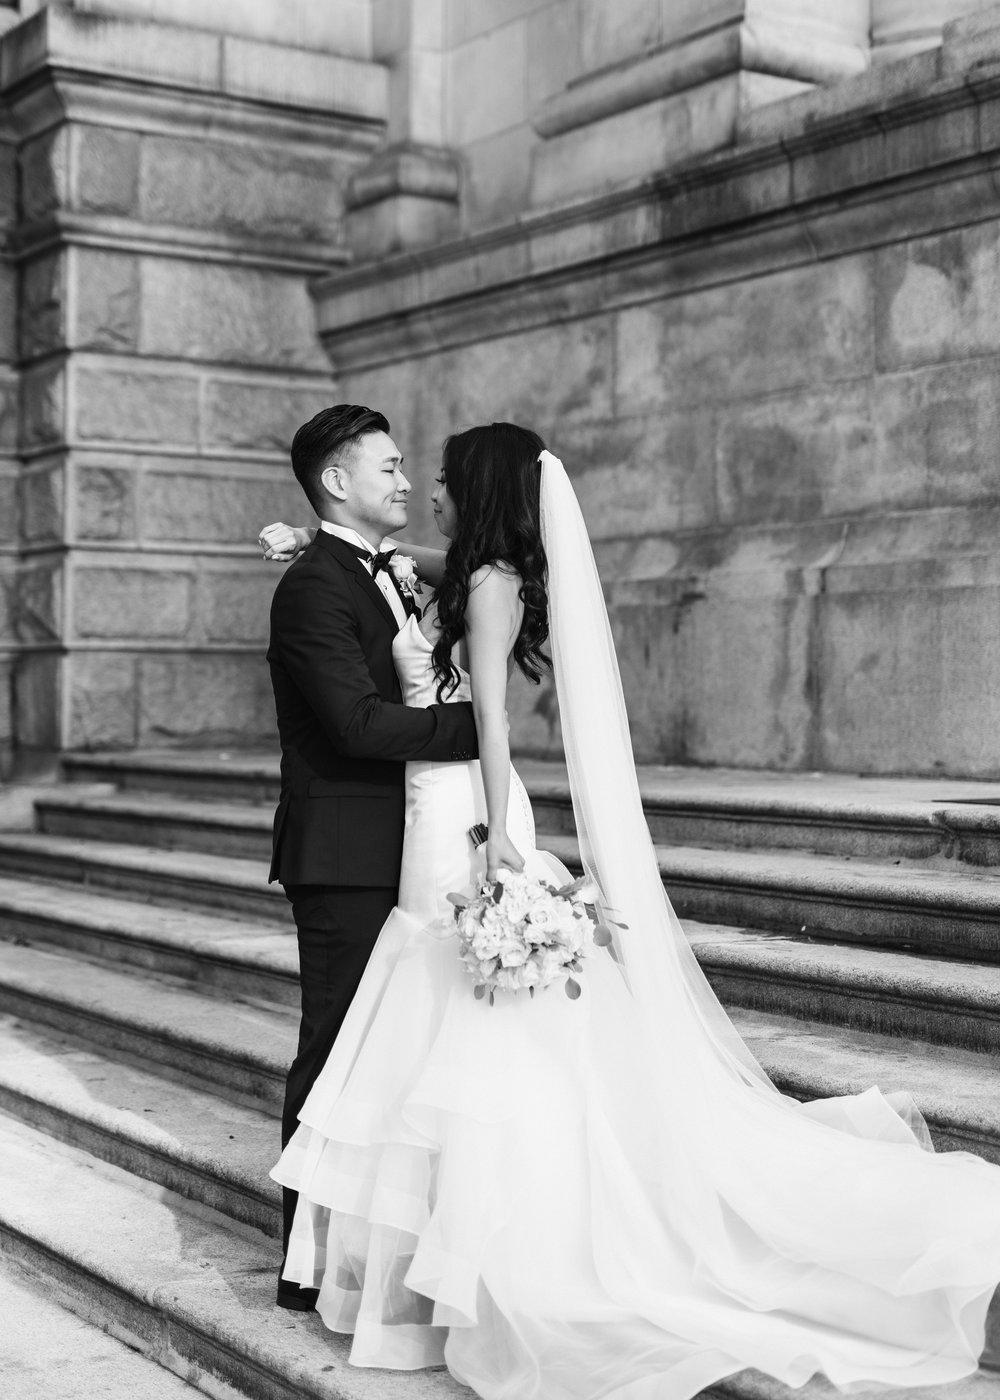 HeraStudios_Selects_Full_KatrinaAndrew_Wedding_Version2-252.jpg